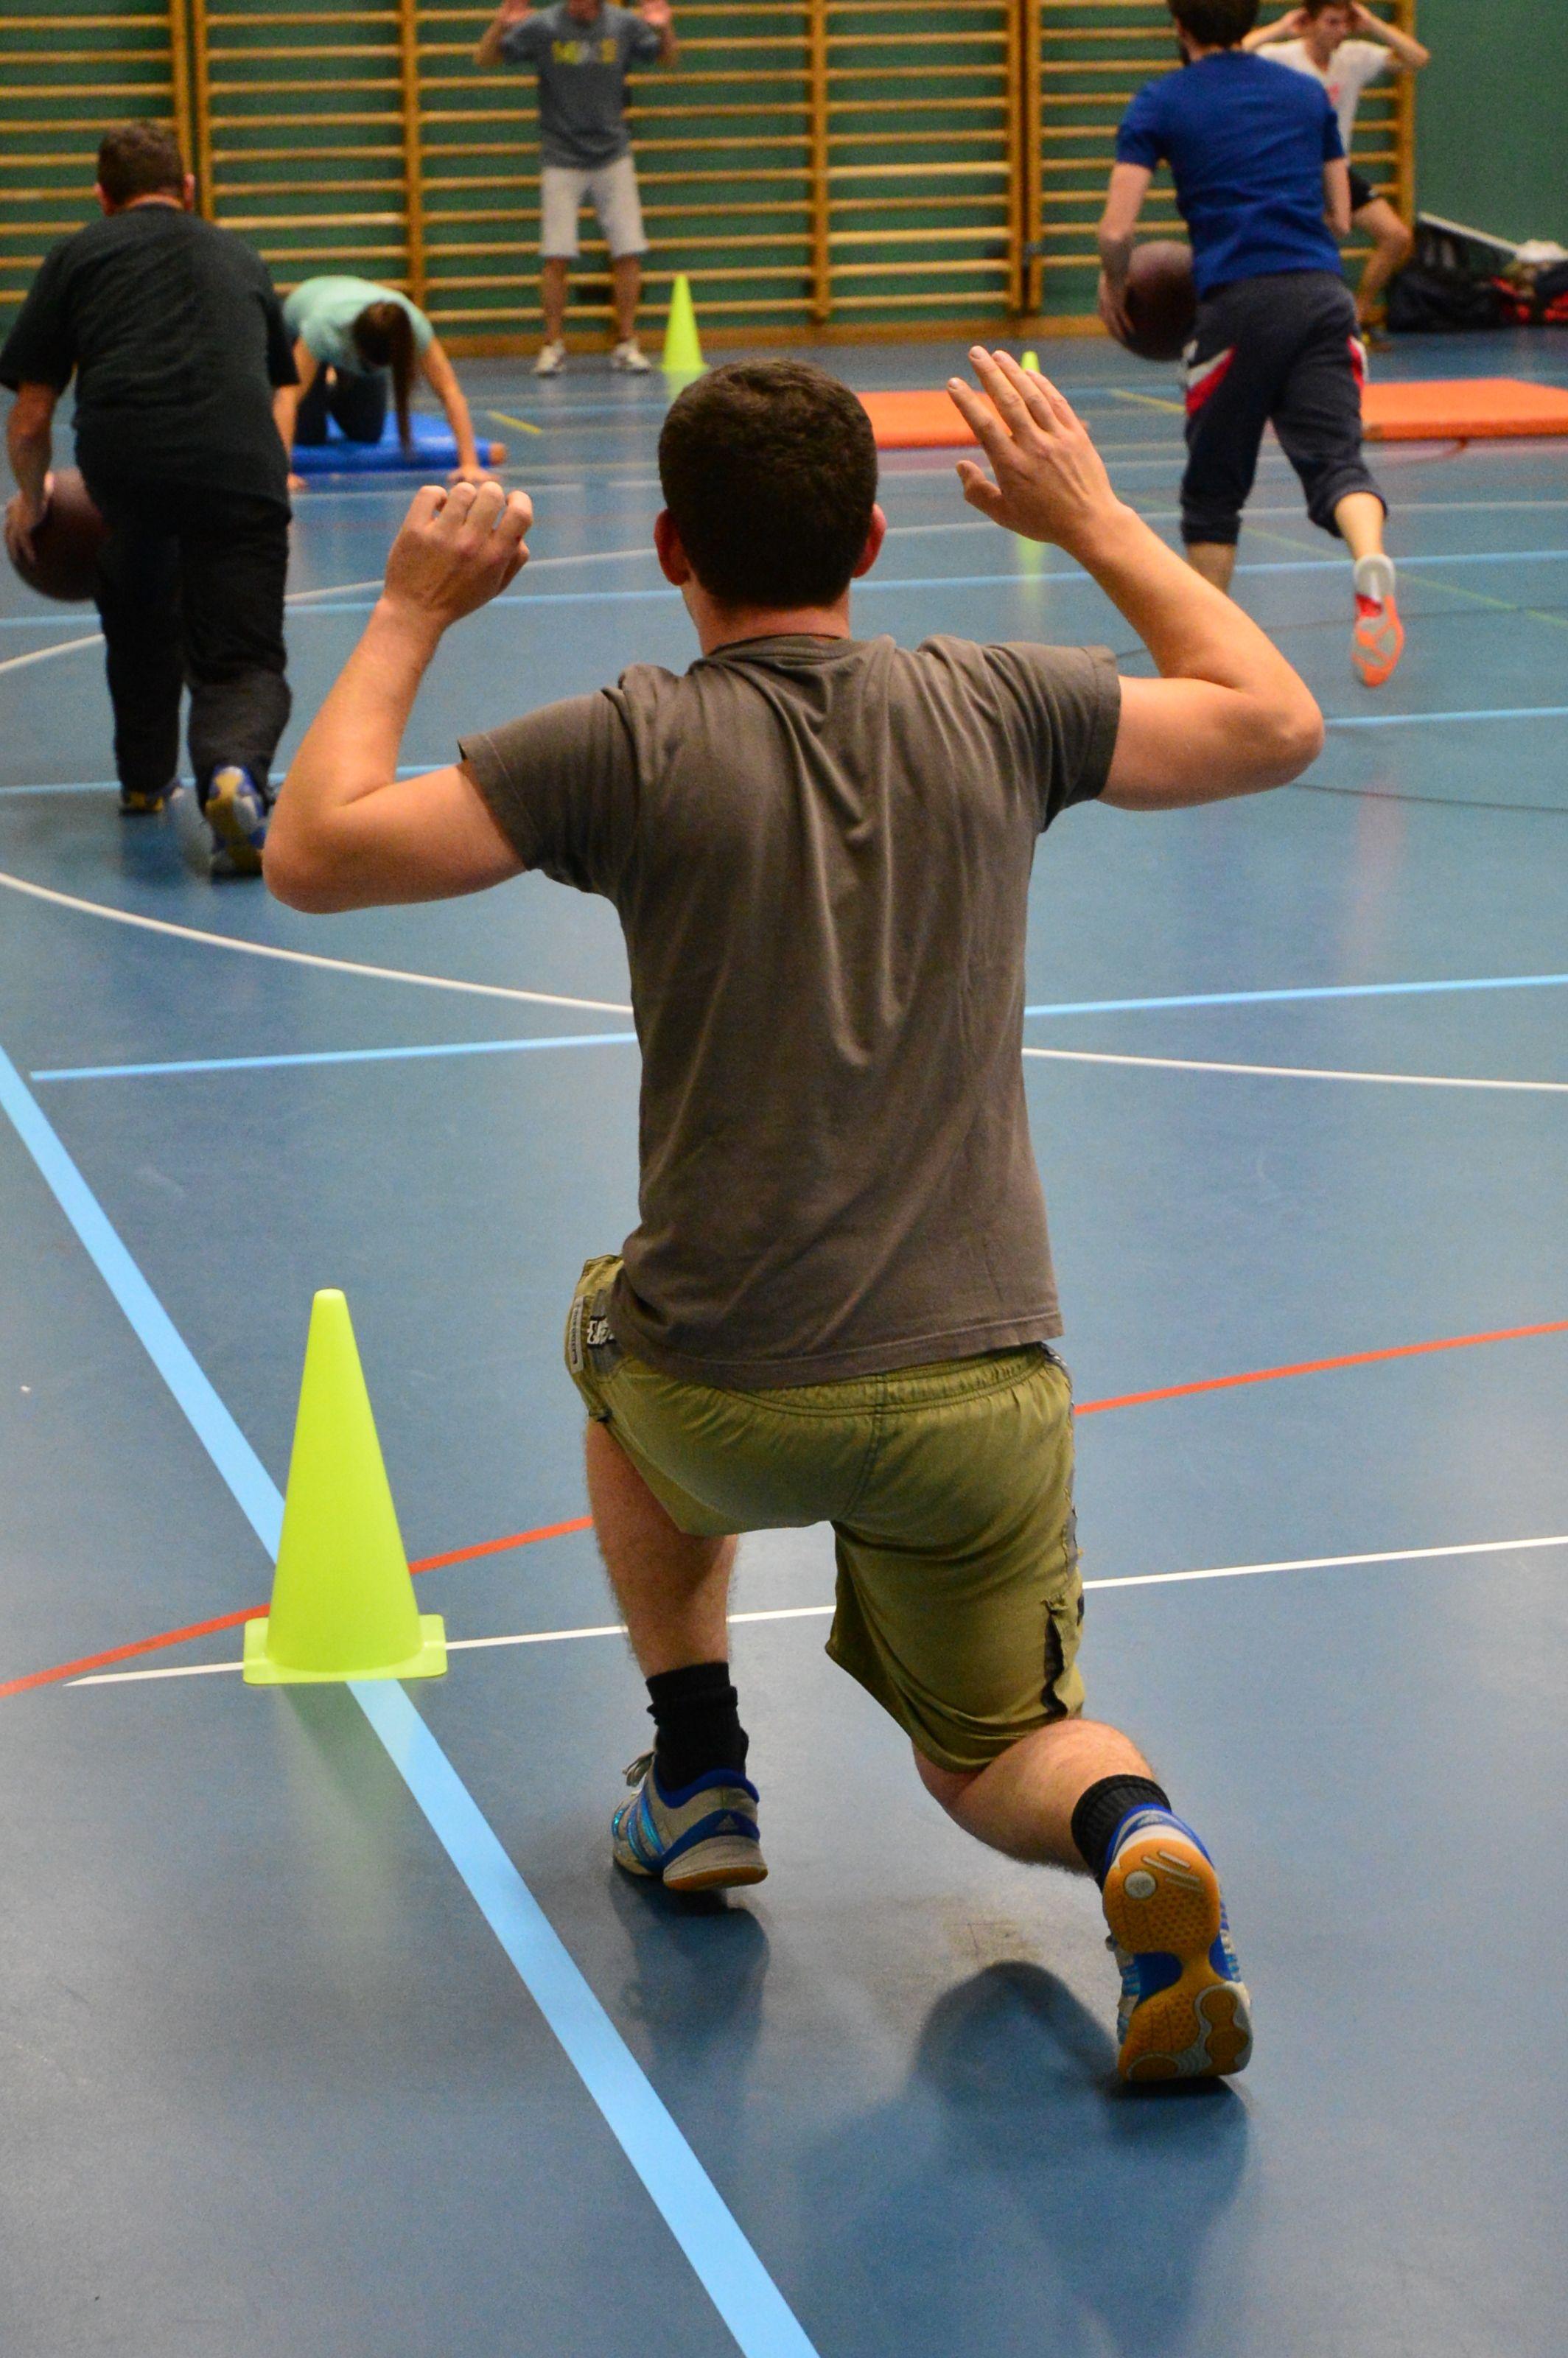 TSVJ-SF-2015-12-08-Bootcamp-mit-Nizio-DSC-MW-7760